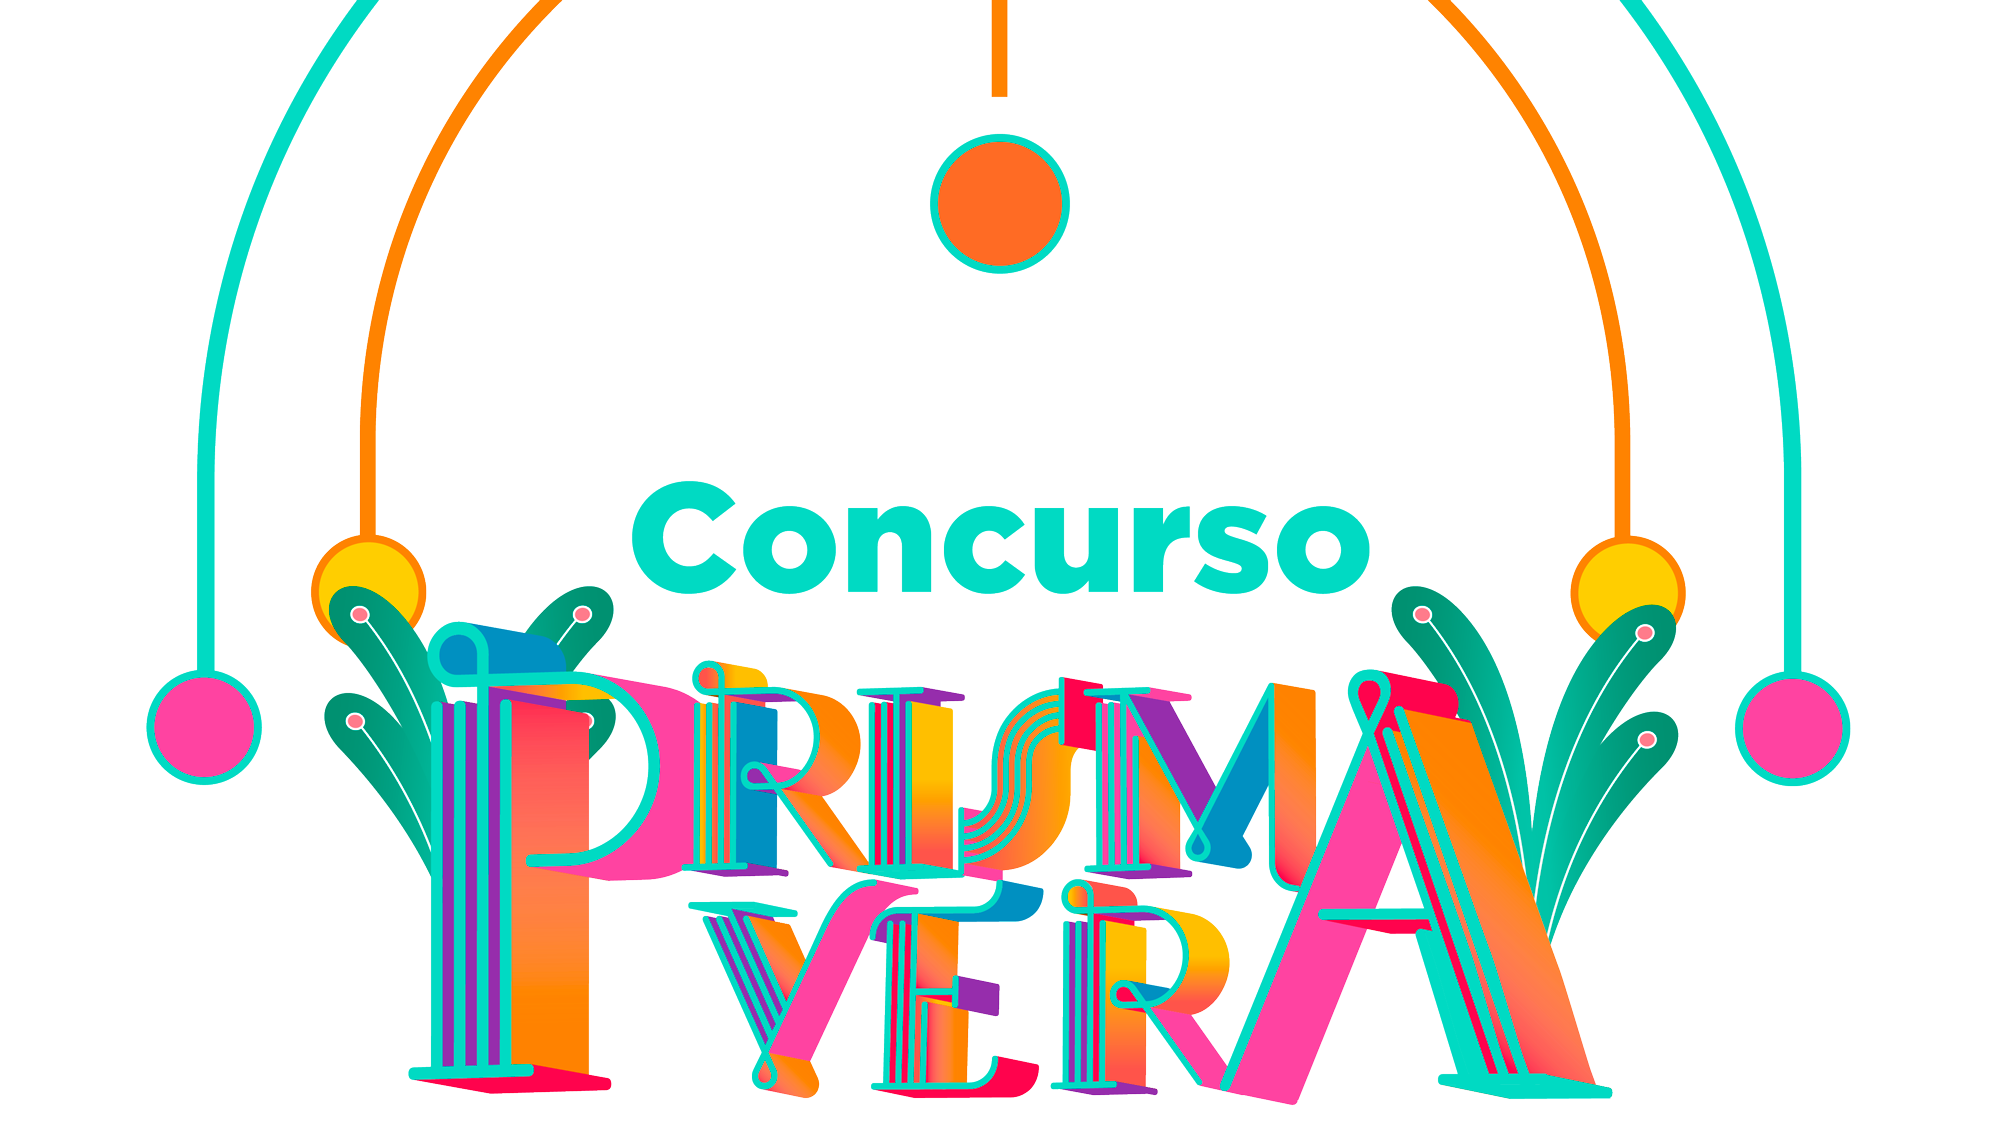 Concurso Prismavera en Viva Envigado